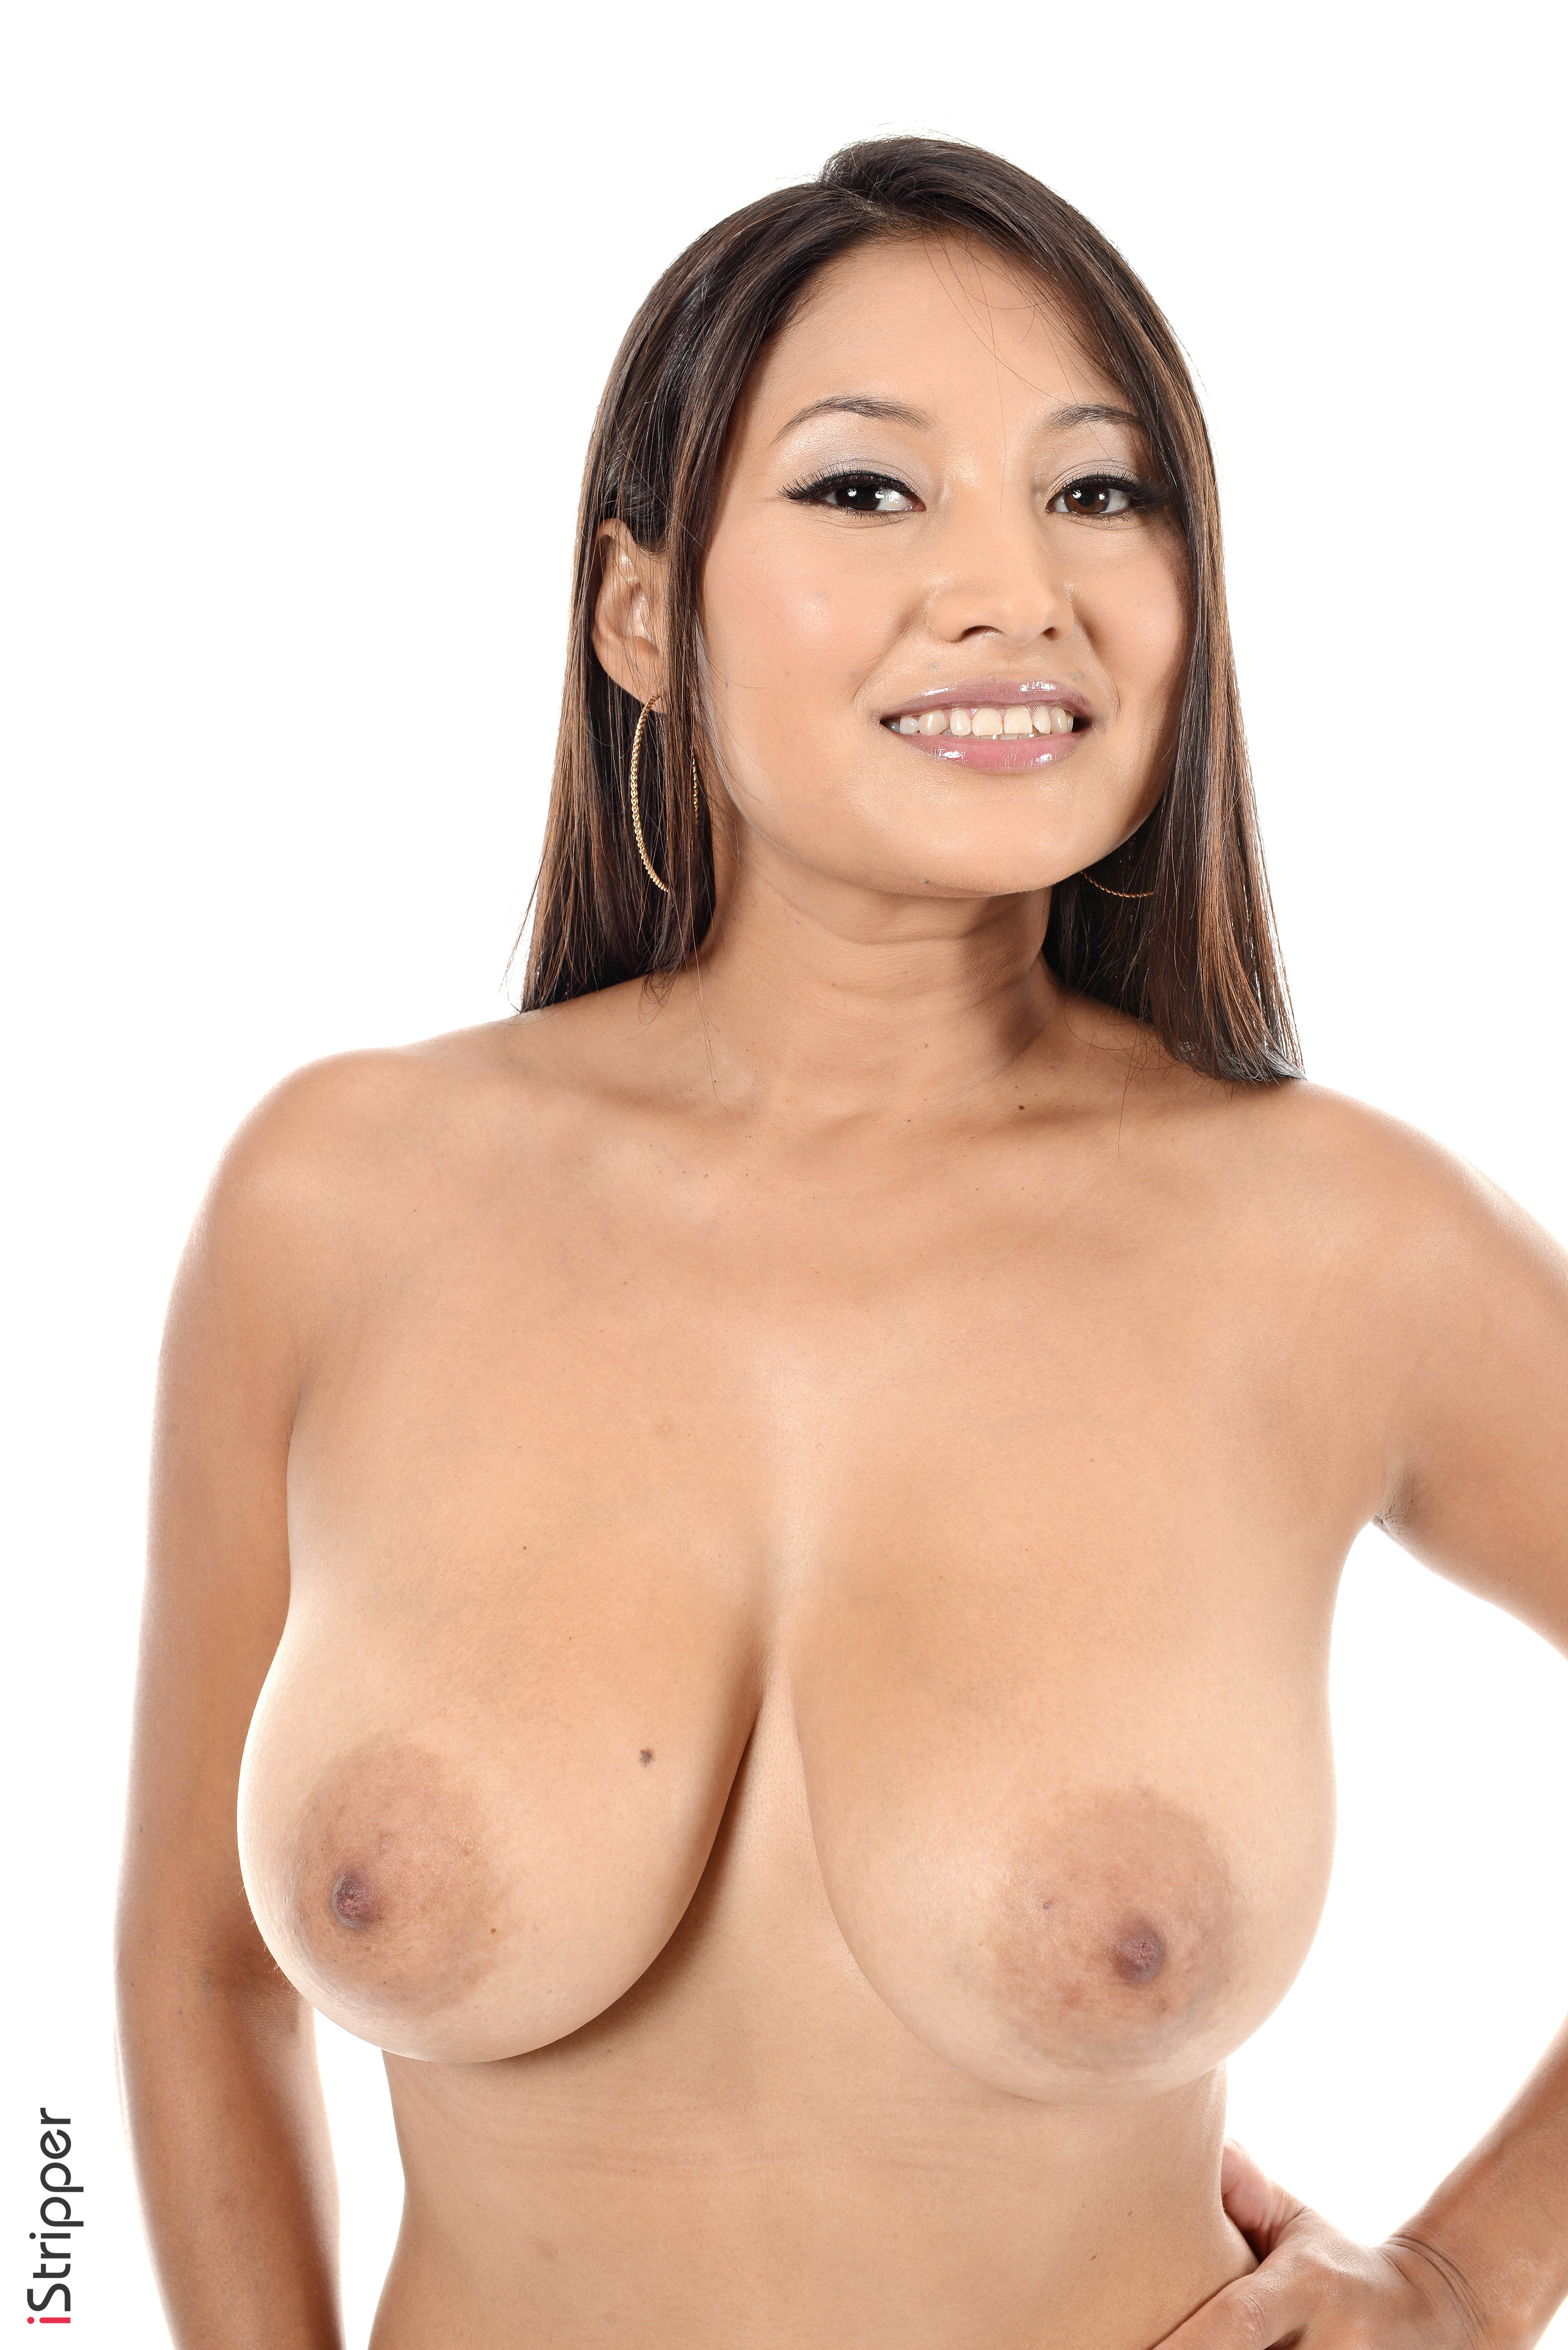 erotic babe wallpaper pack